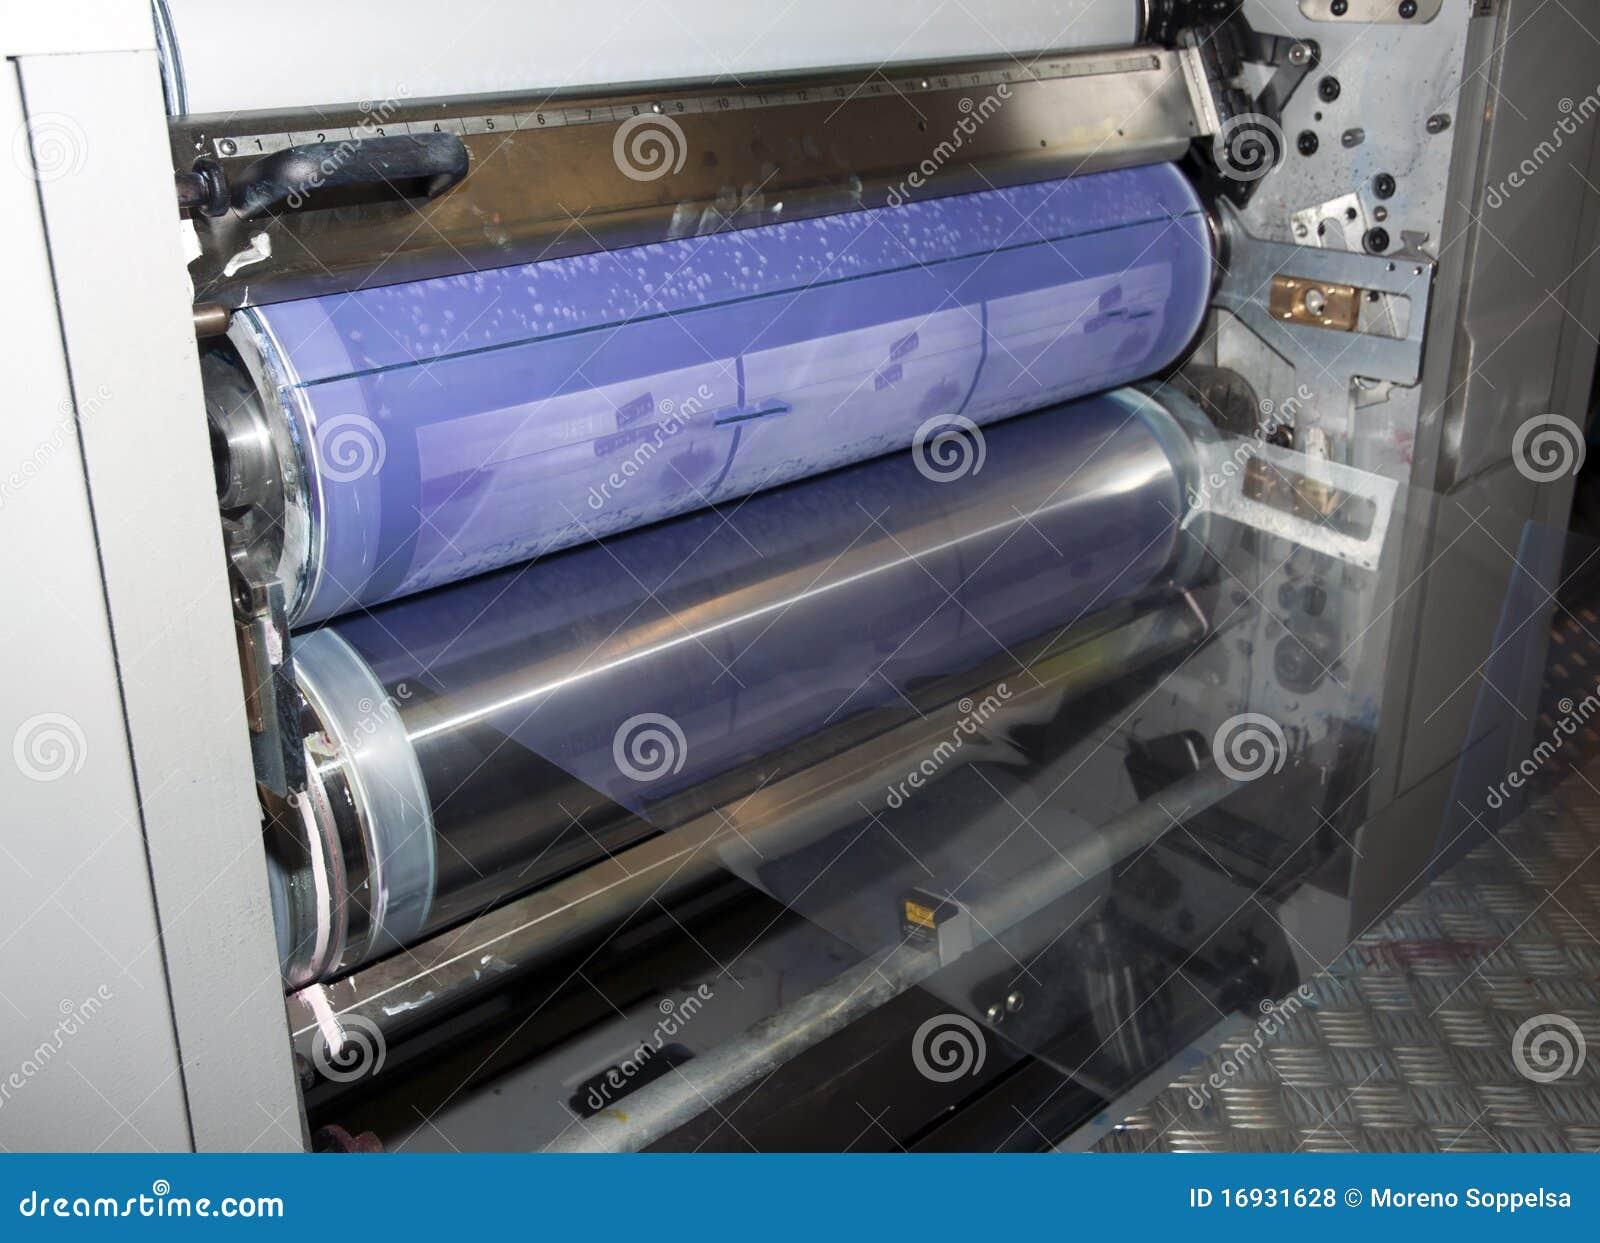 Impresión de la prensa (imprenta) - compense, detalle